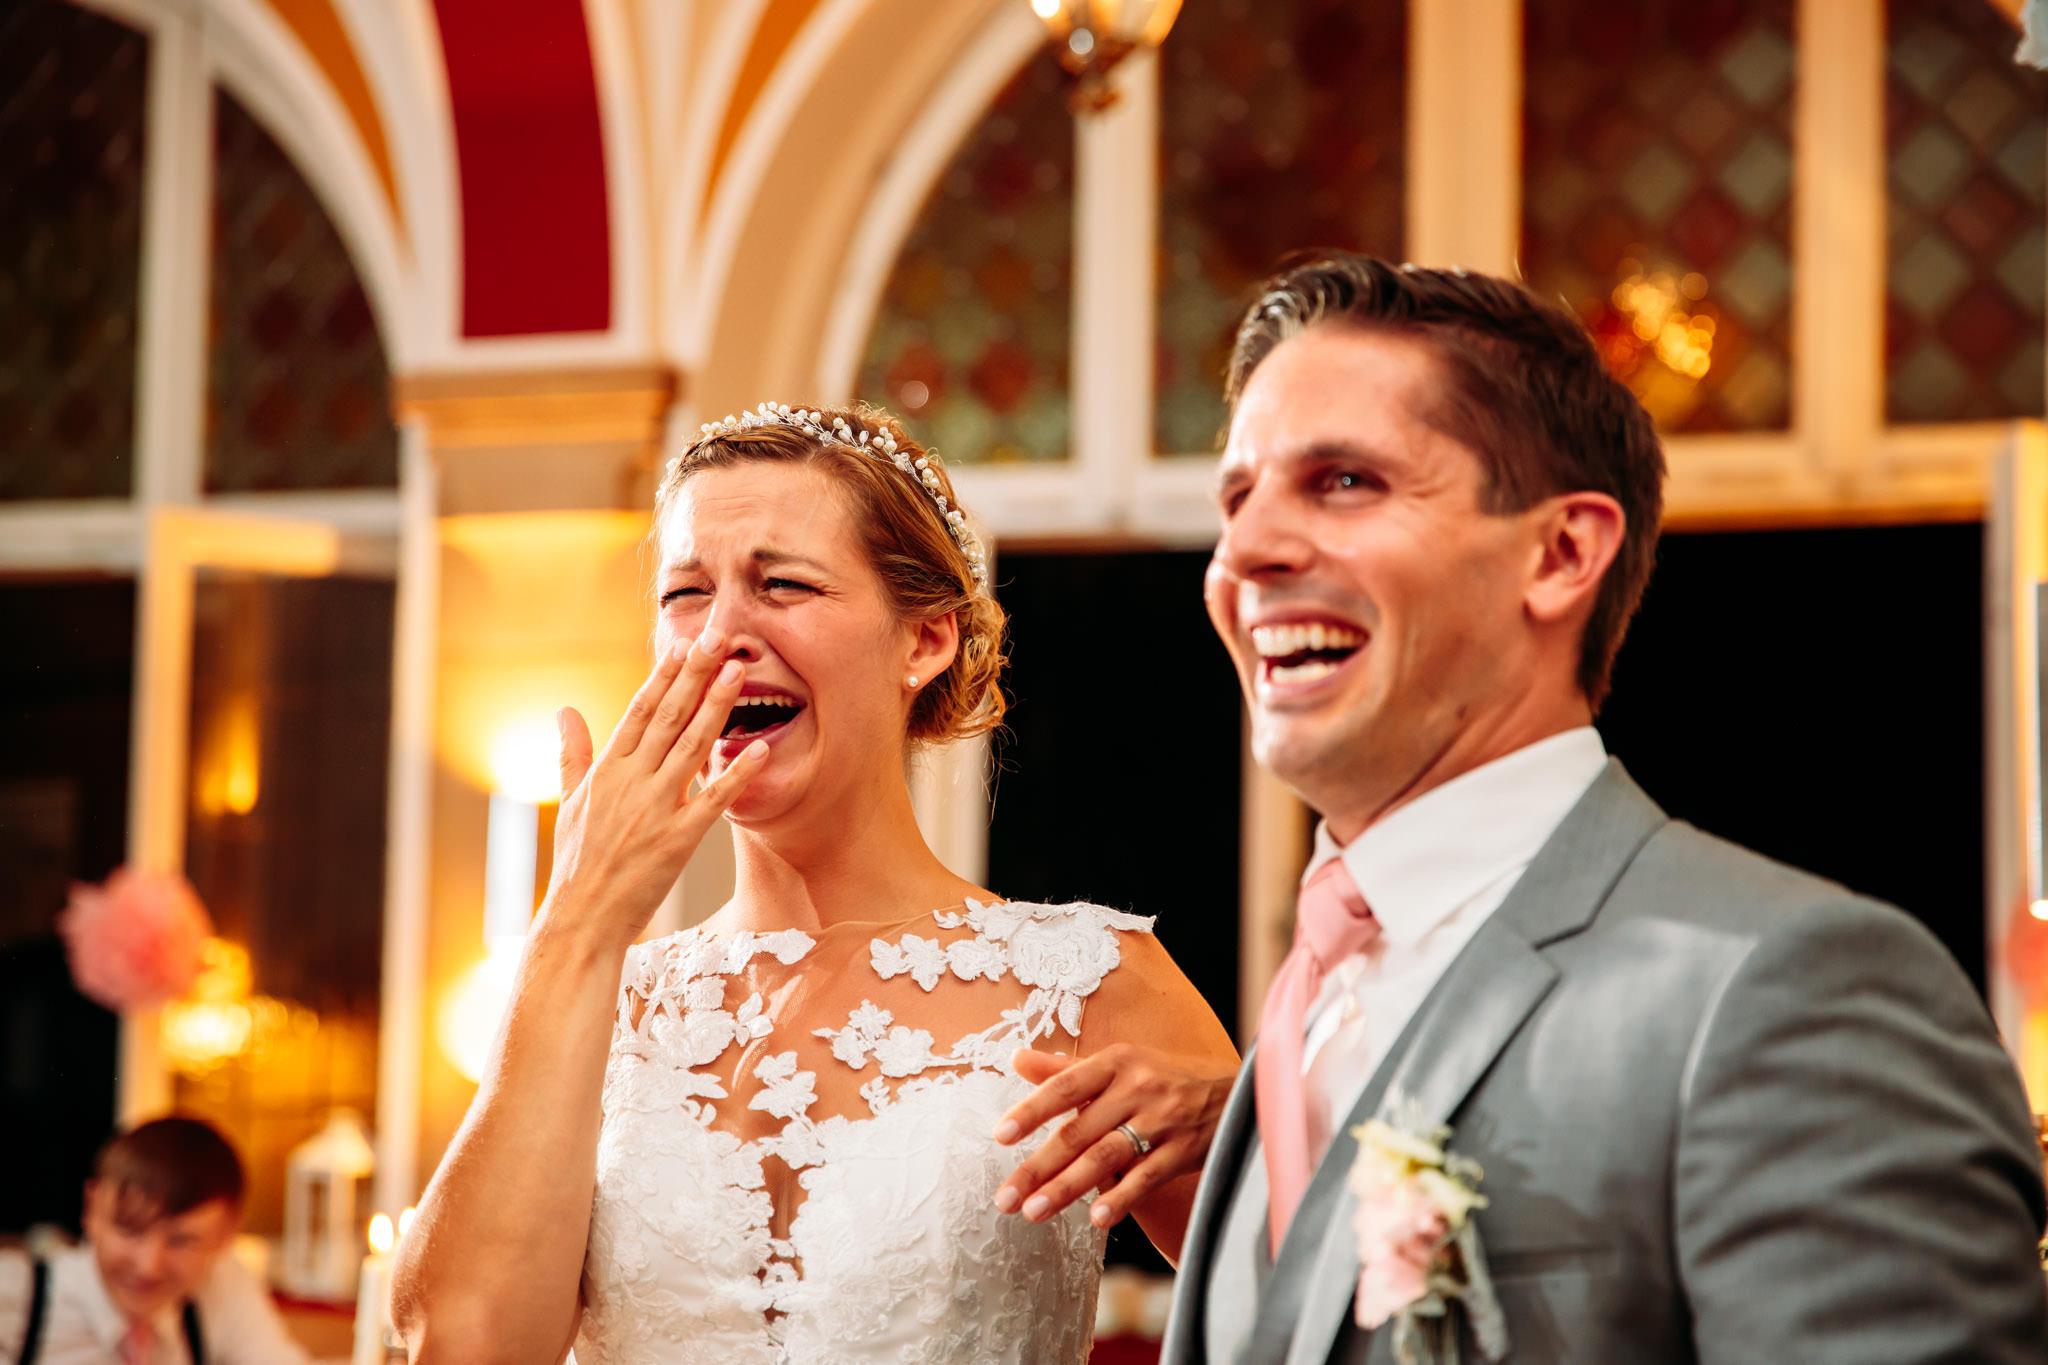 180818_Hochzeit_german_american_grunewald_berlin_locanda_12_apostoli_wedding_web_0024.jpg